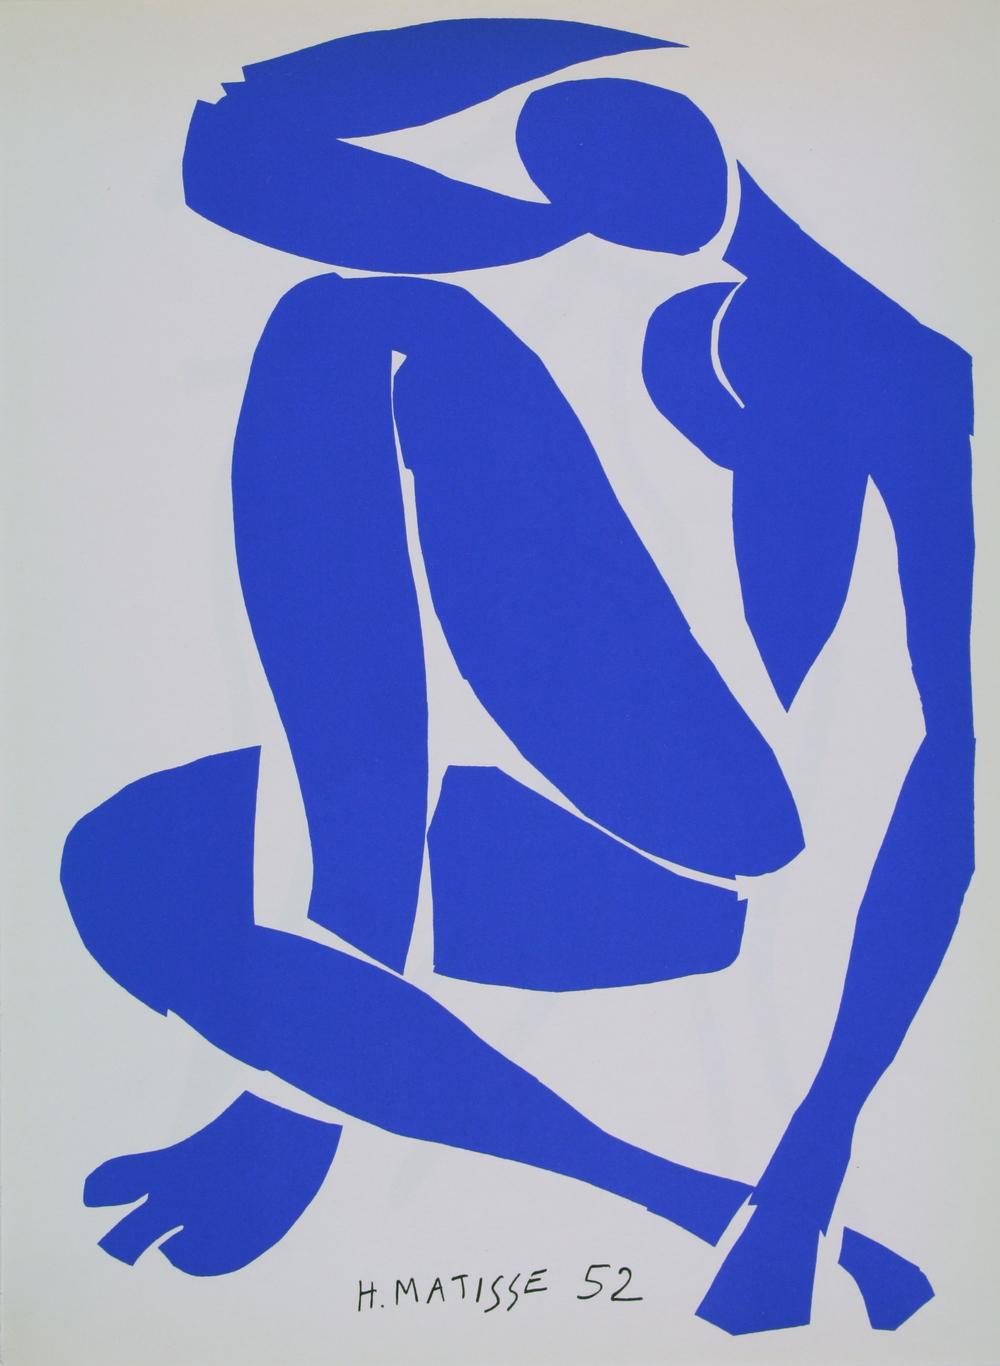 Year: 1954-58 Medium: Lithograph Image size: 10 x 12